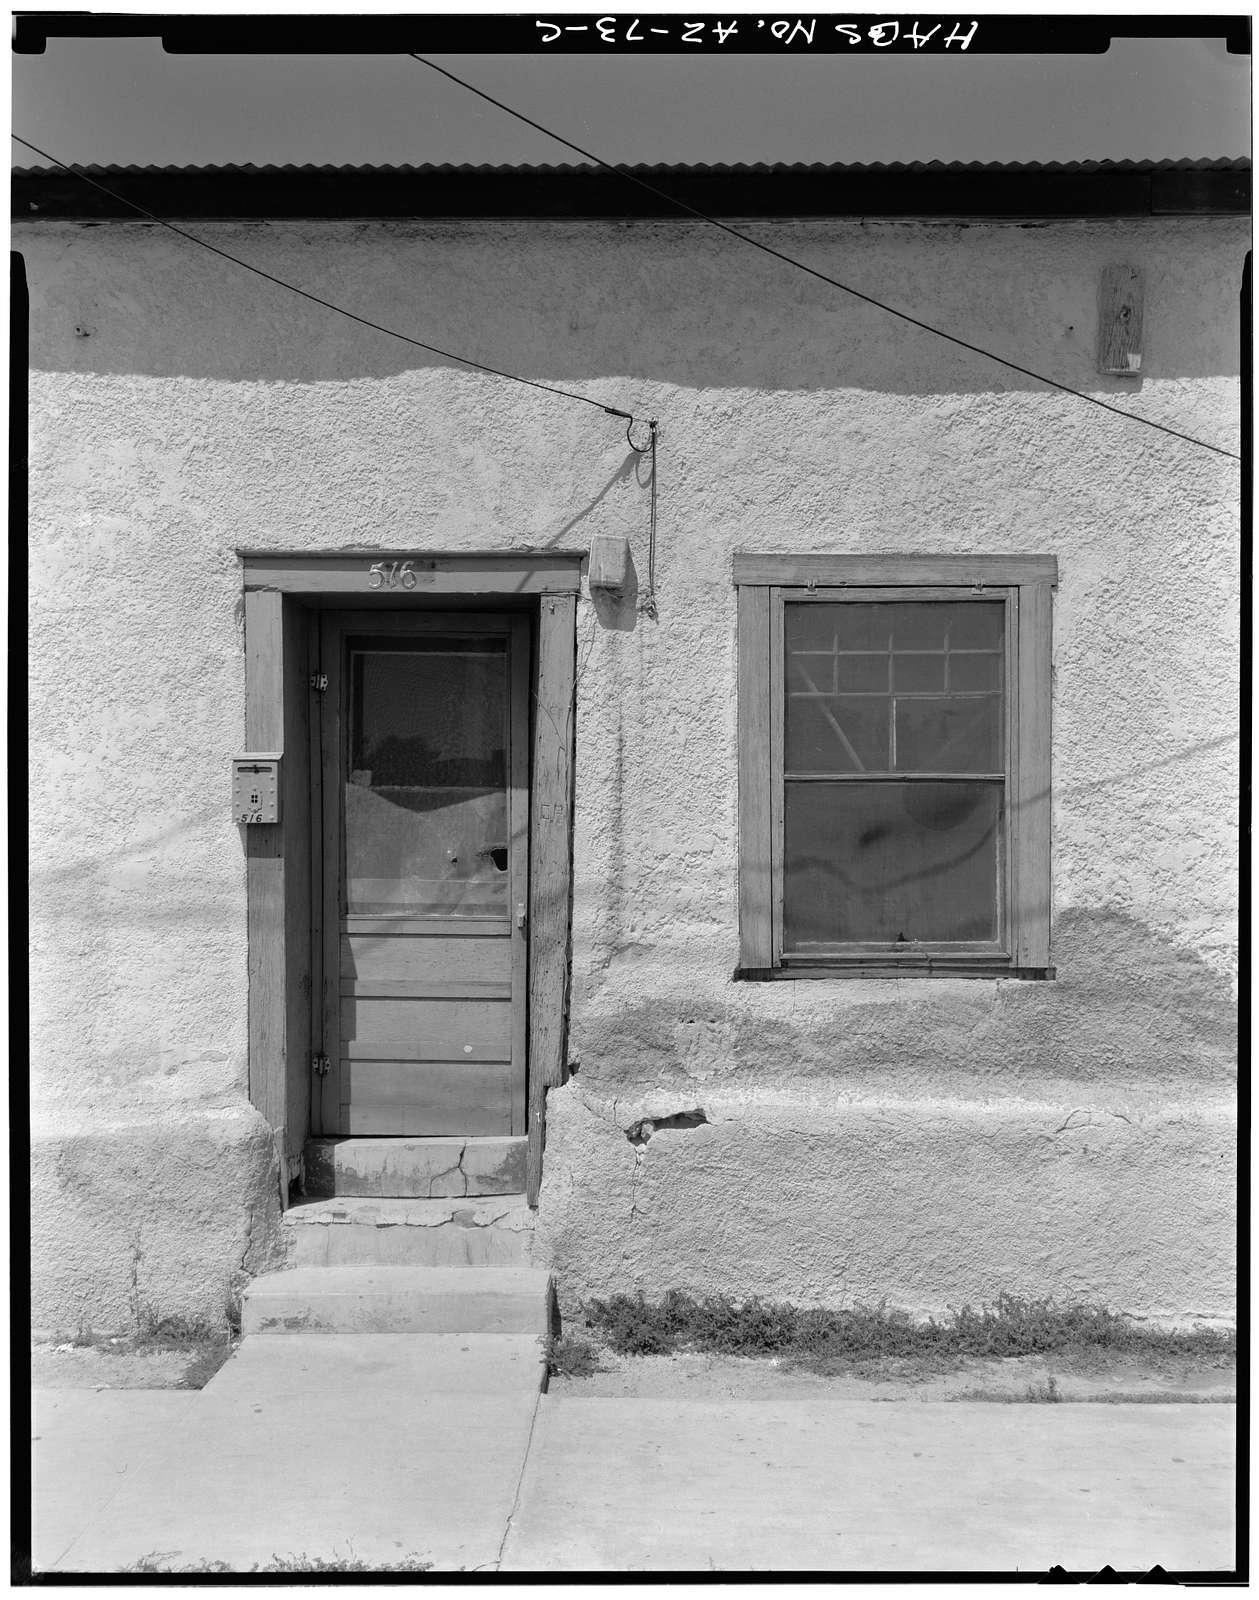 508-518 South Meyer Avenue (Apartments), Tucson, Pima County, AZ